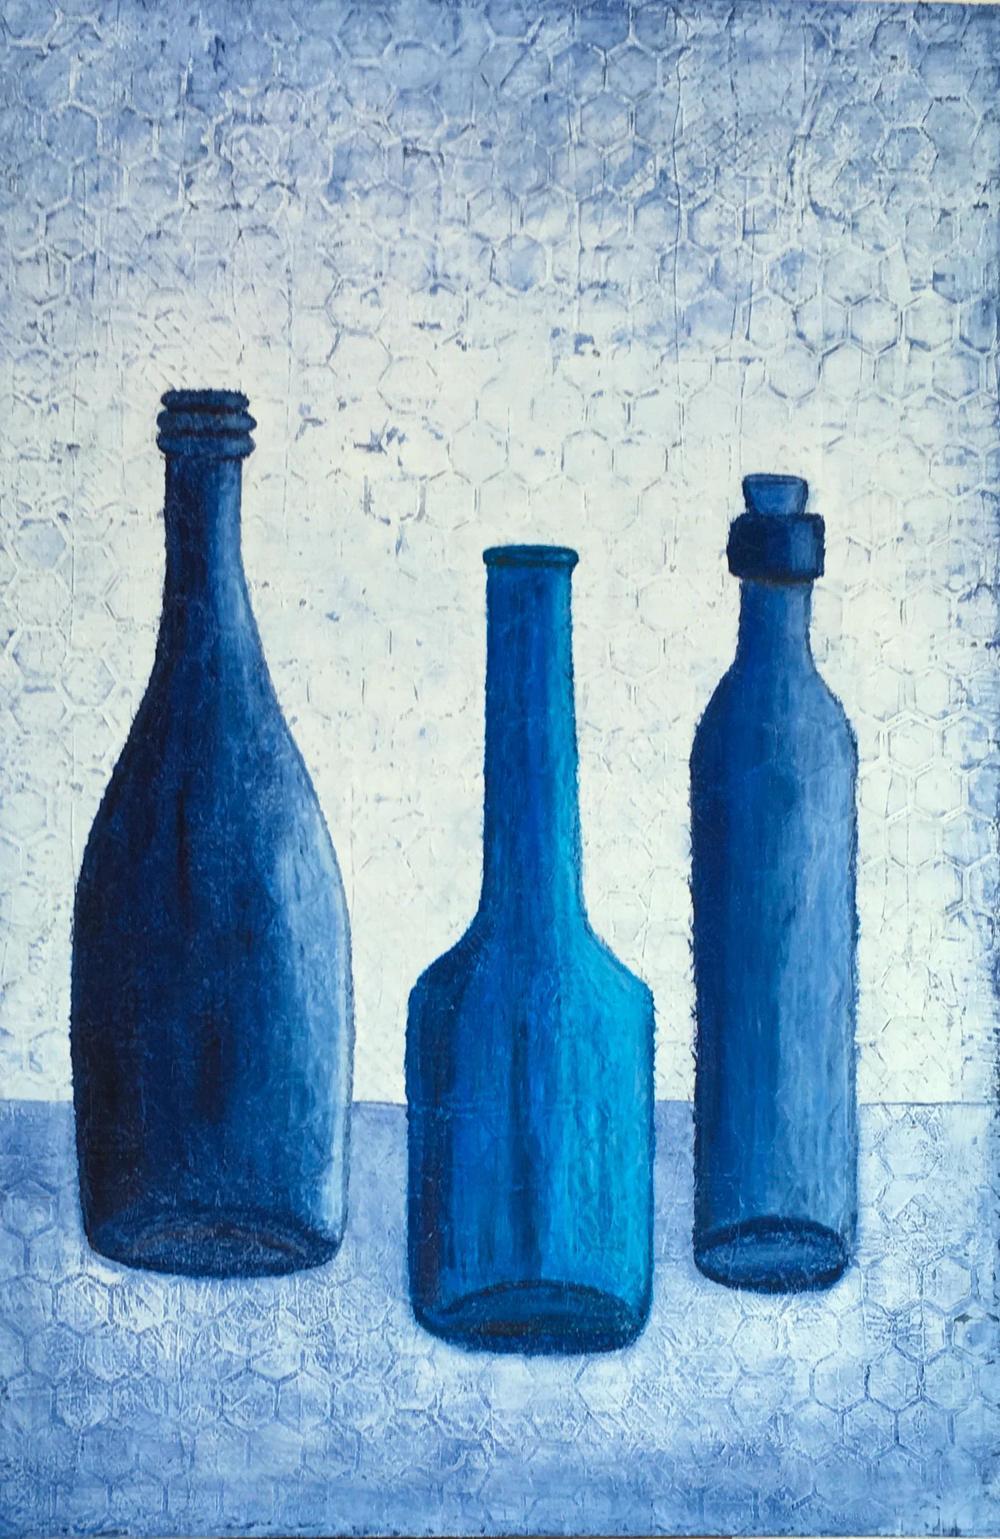 Bottle Blues original still life painting on canvas by Terri Deskins